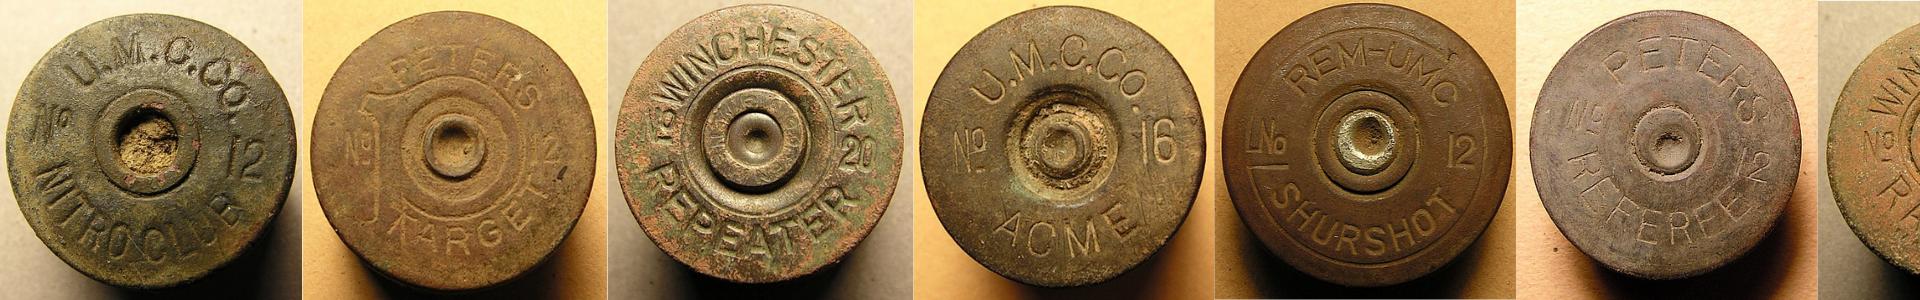 Shotgun shell headstamp identification